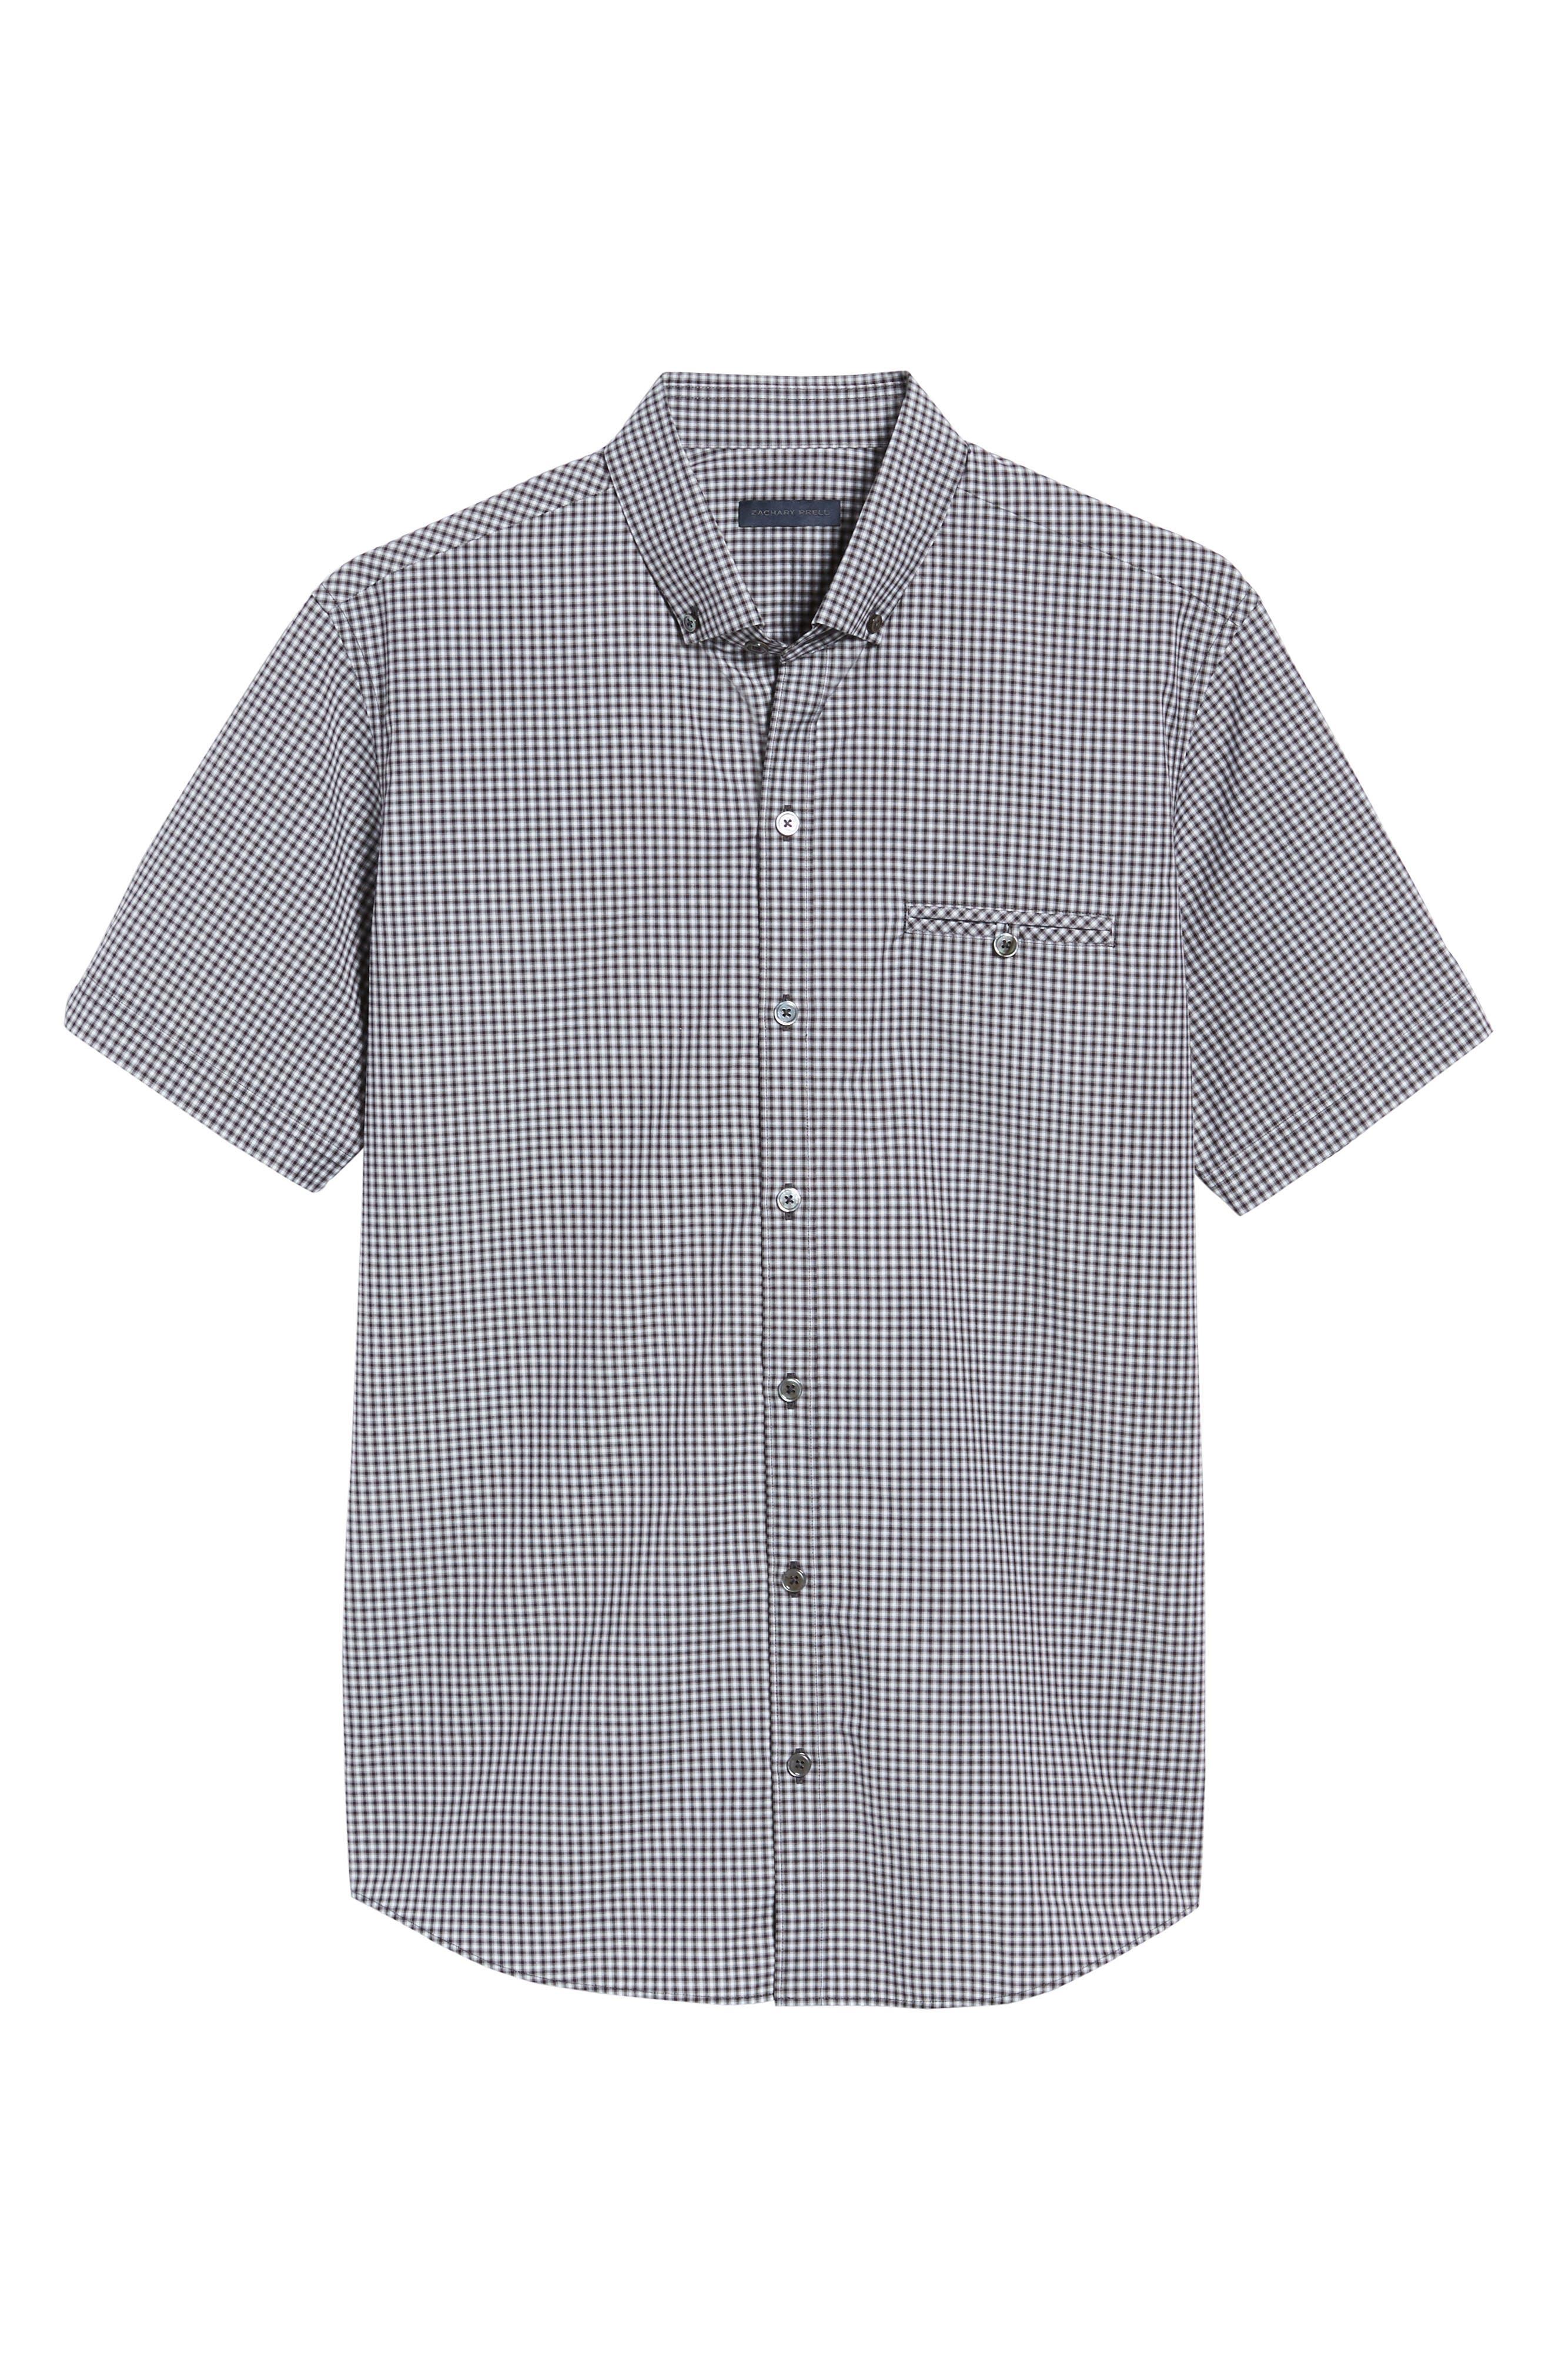 Ahmed Slim Fit Plaid Sport Shirt,                             Alternate thumbnail 6, color,                             021